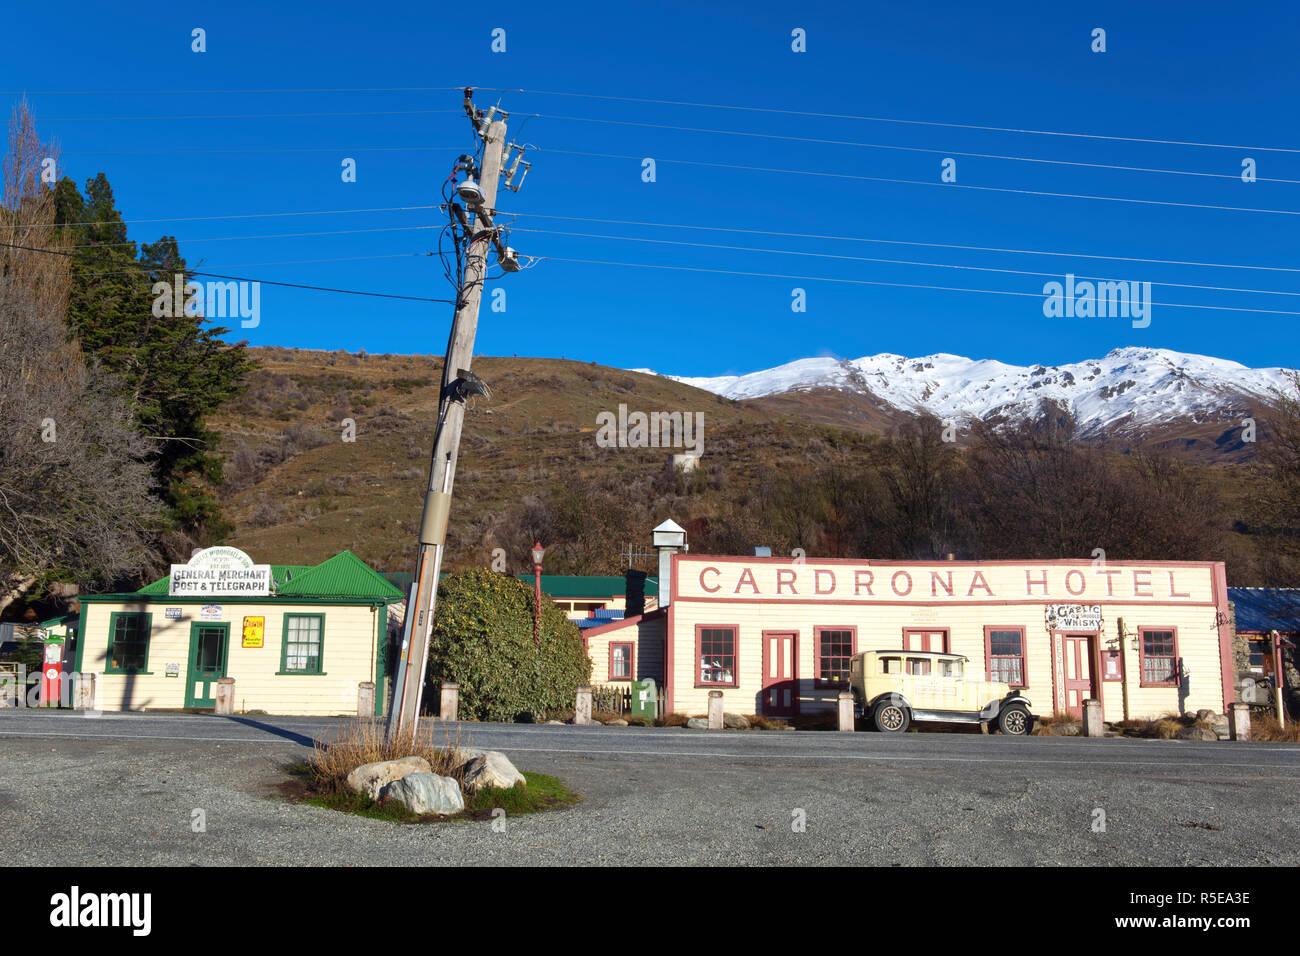 The Historic Cardrona Hotel, Cardrona, Central Otago, South Island, New Zealand - Stock Image